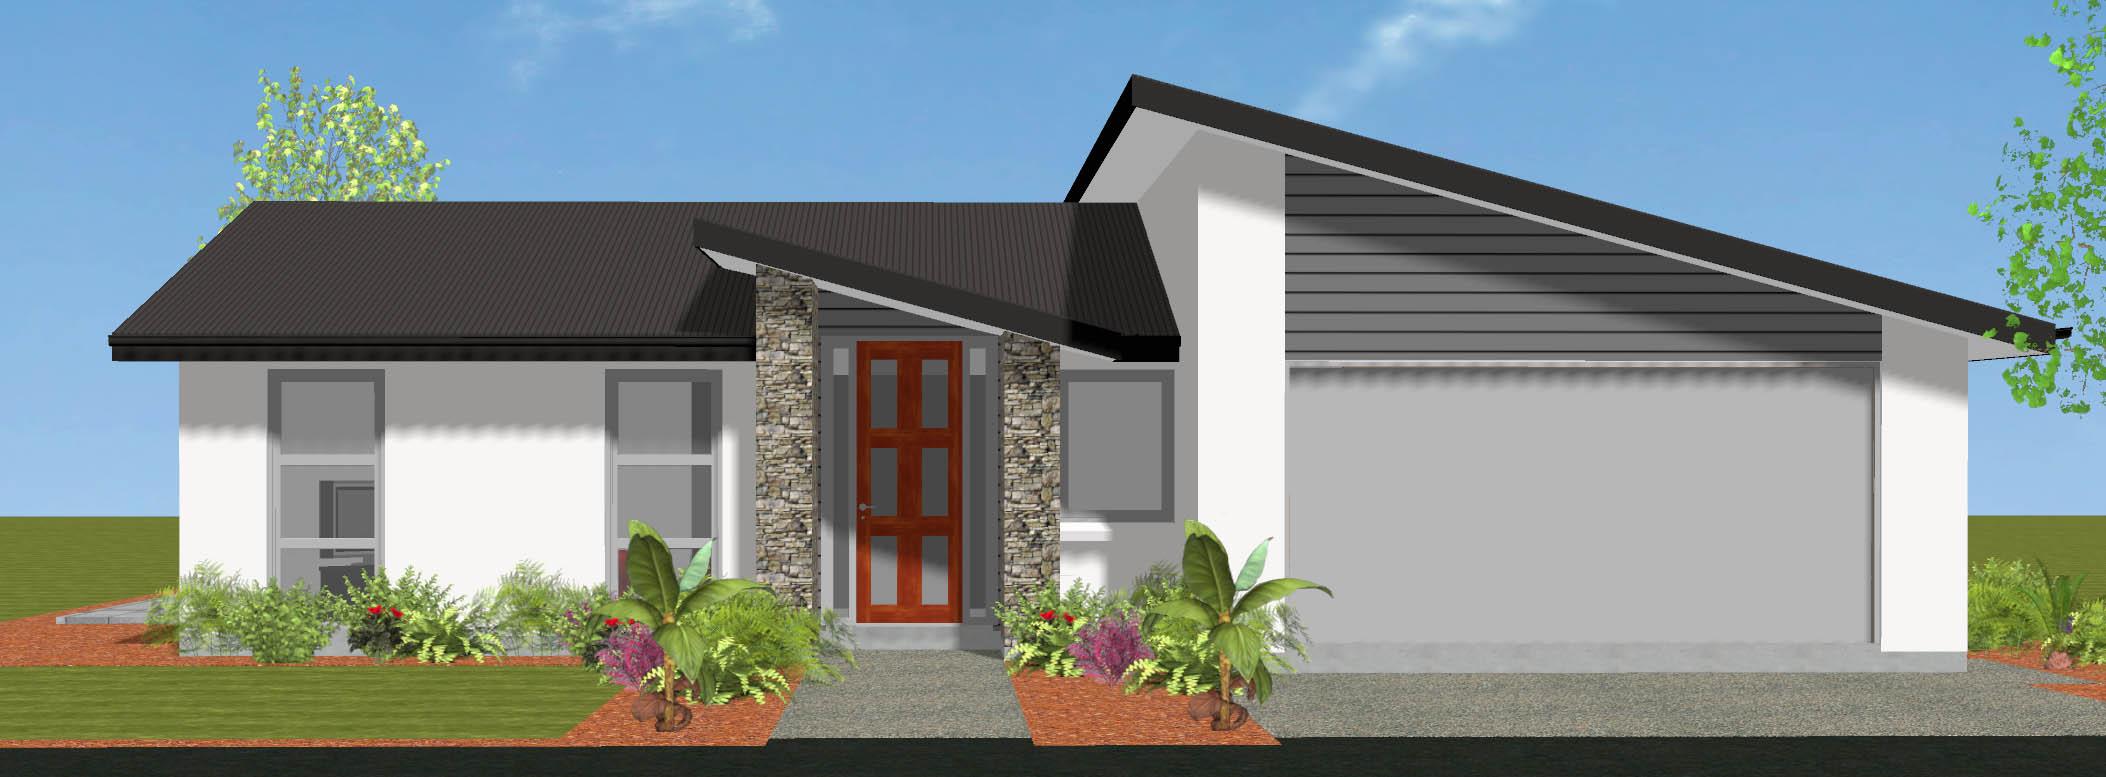 Collingwood new house plan and design wellington kapiti for Home design diamonds